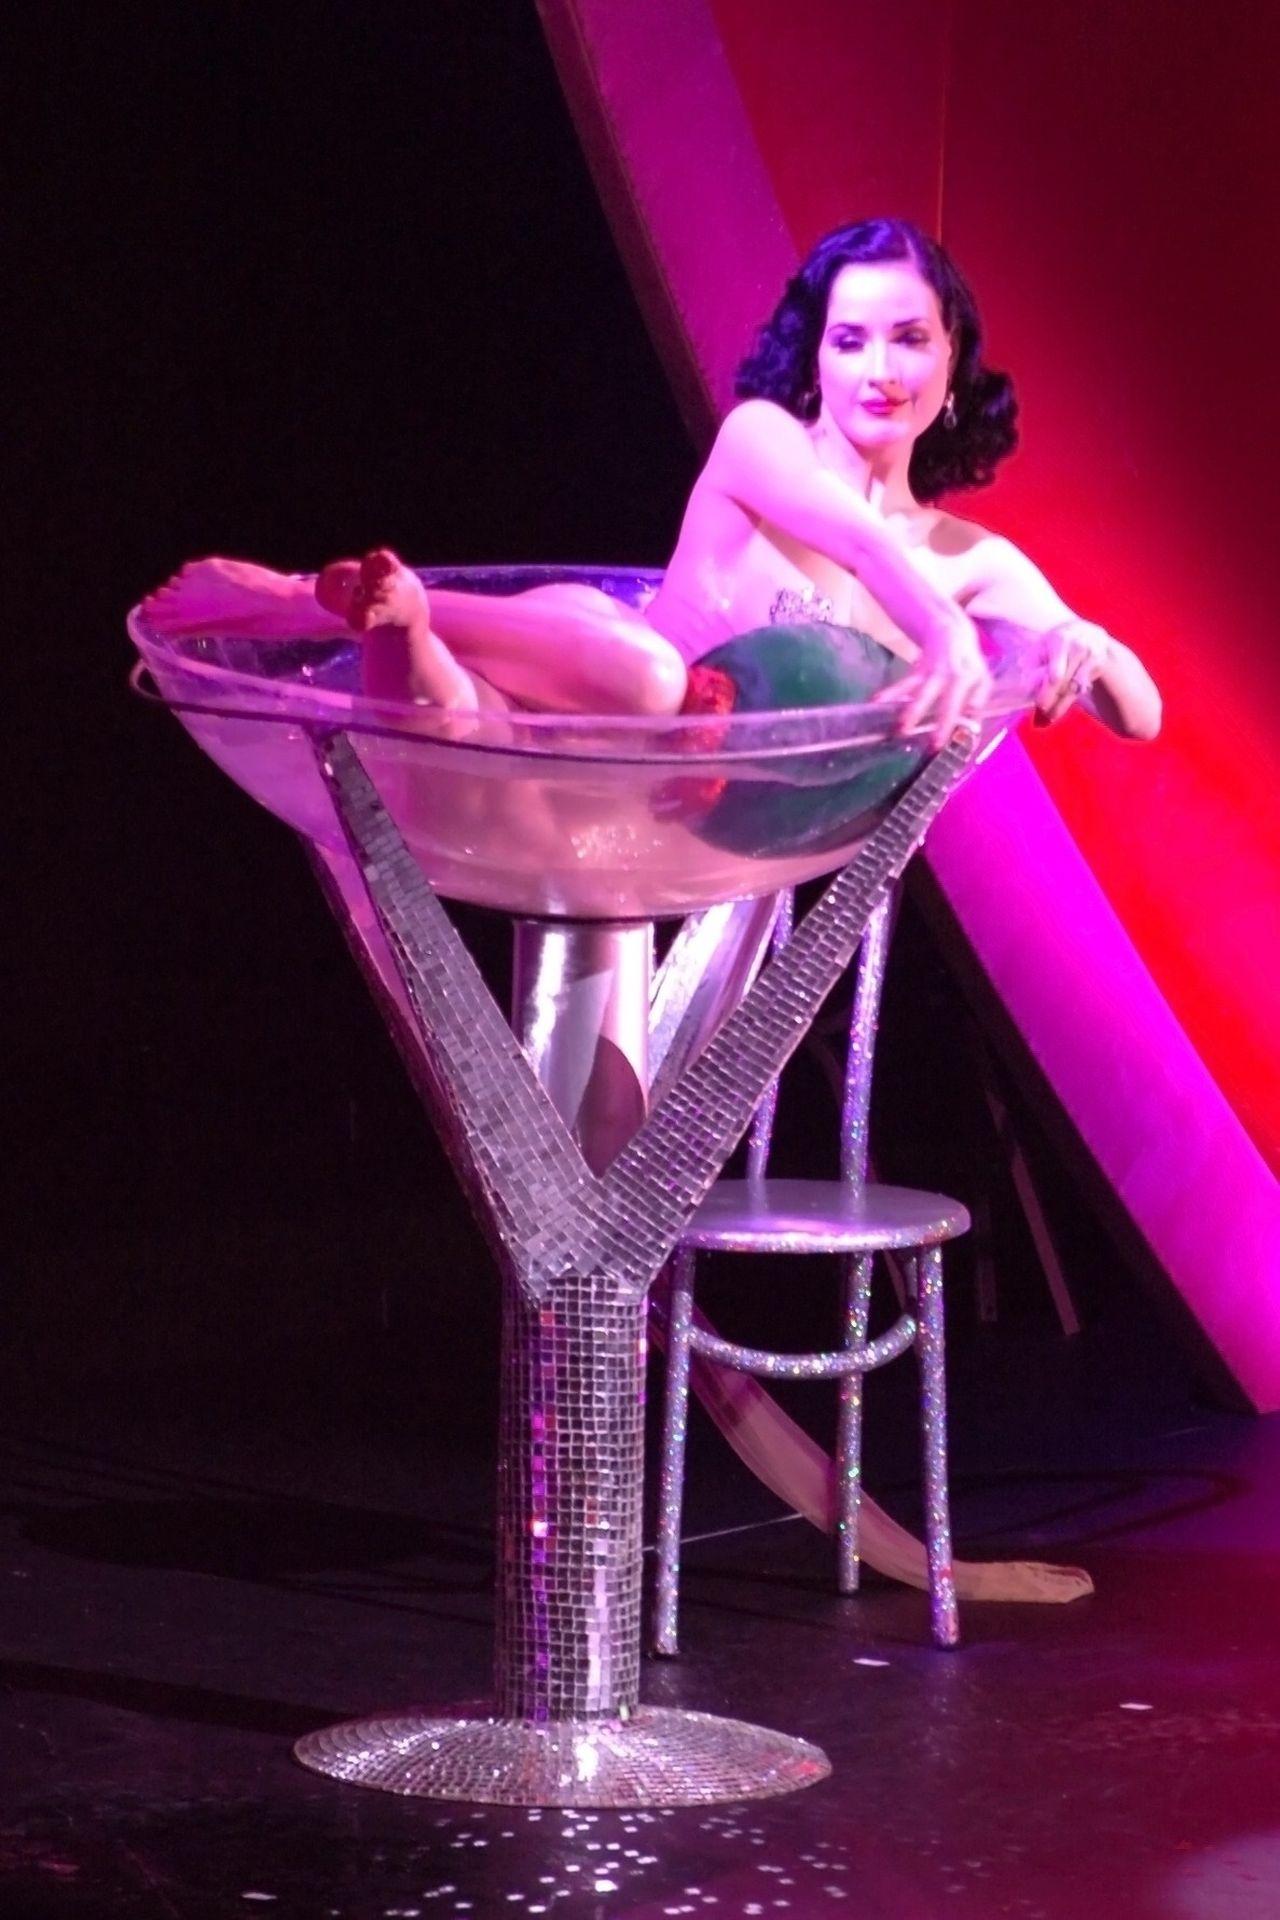 Dita Von Teese Performs At Erotica 06 In London 0024